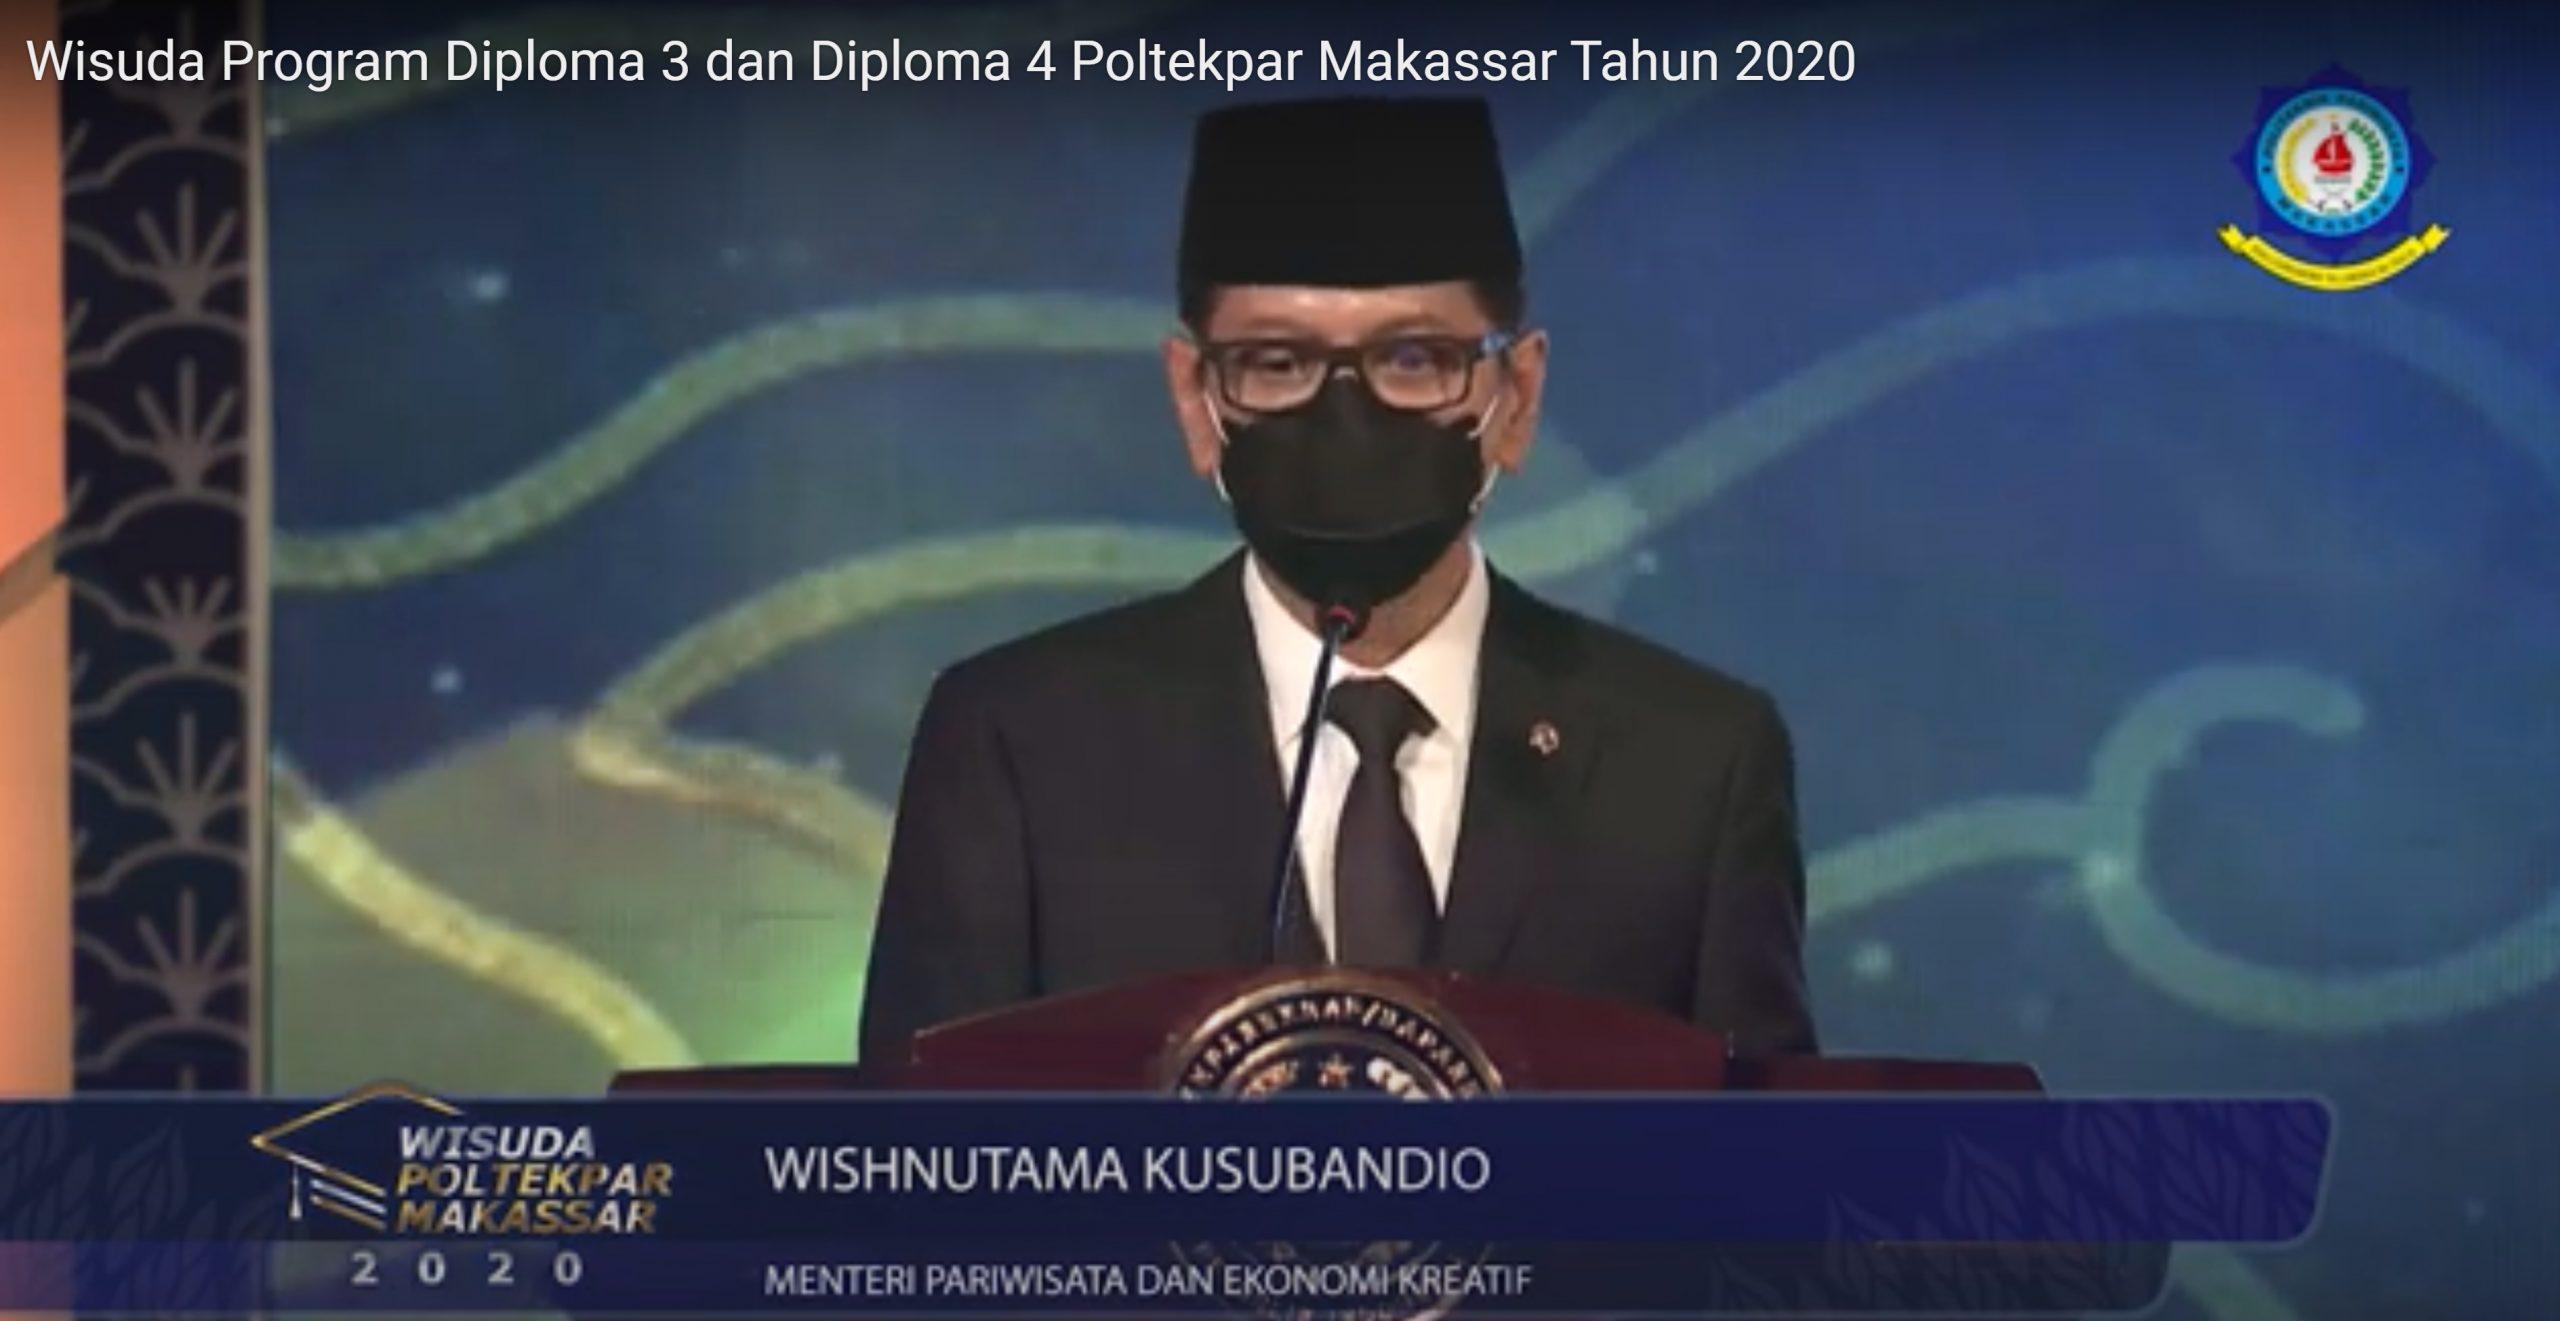 Wisuda Virtual Poltekpar Makassar Tahun 2020